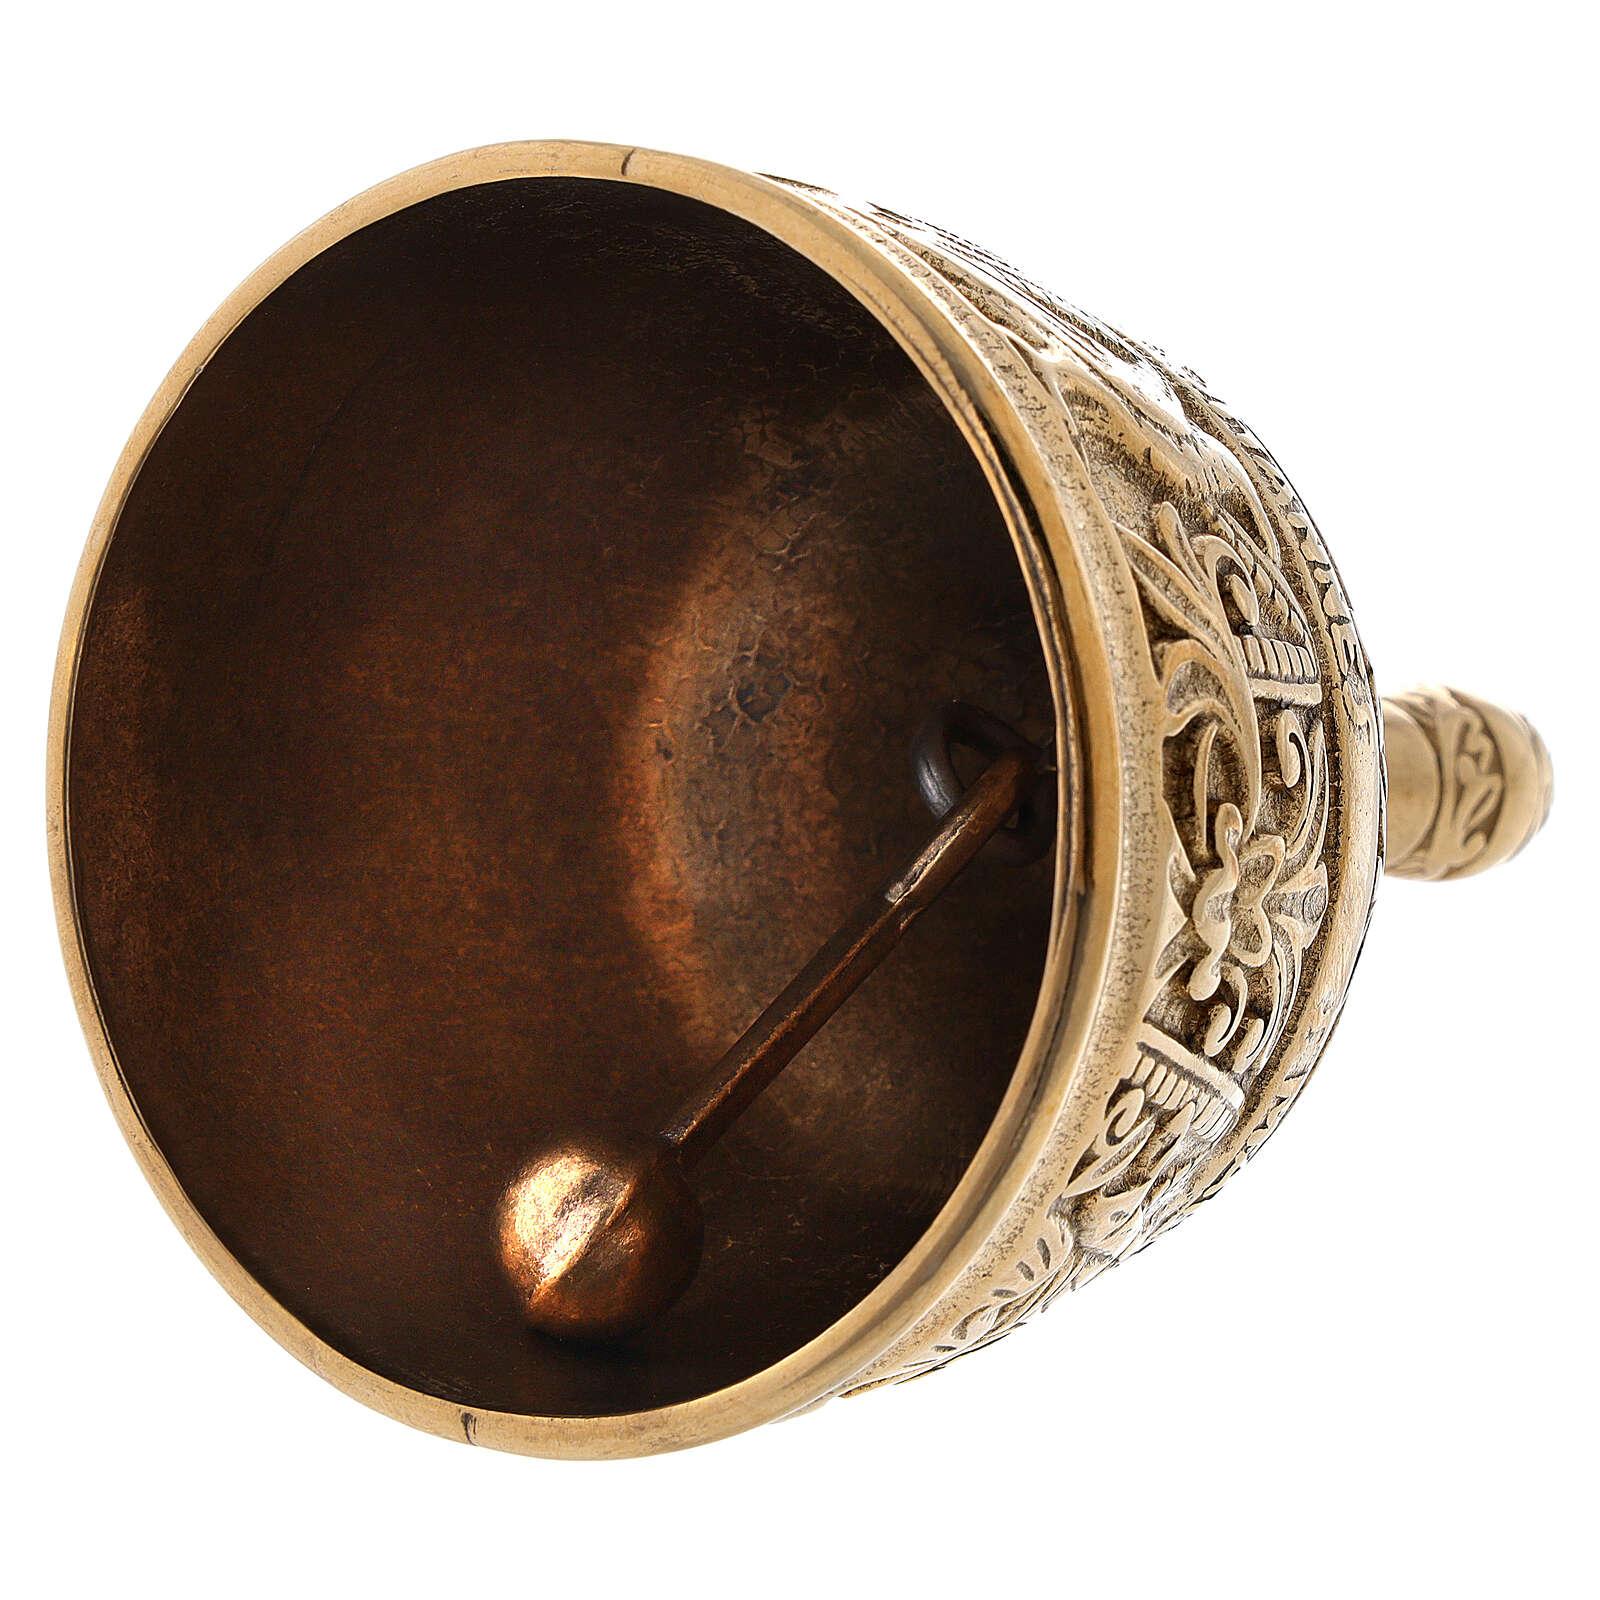 Liturgical bell four evangelists in golden brass 3